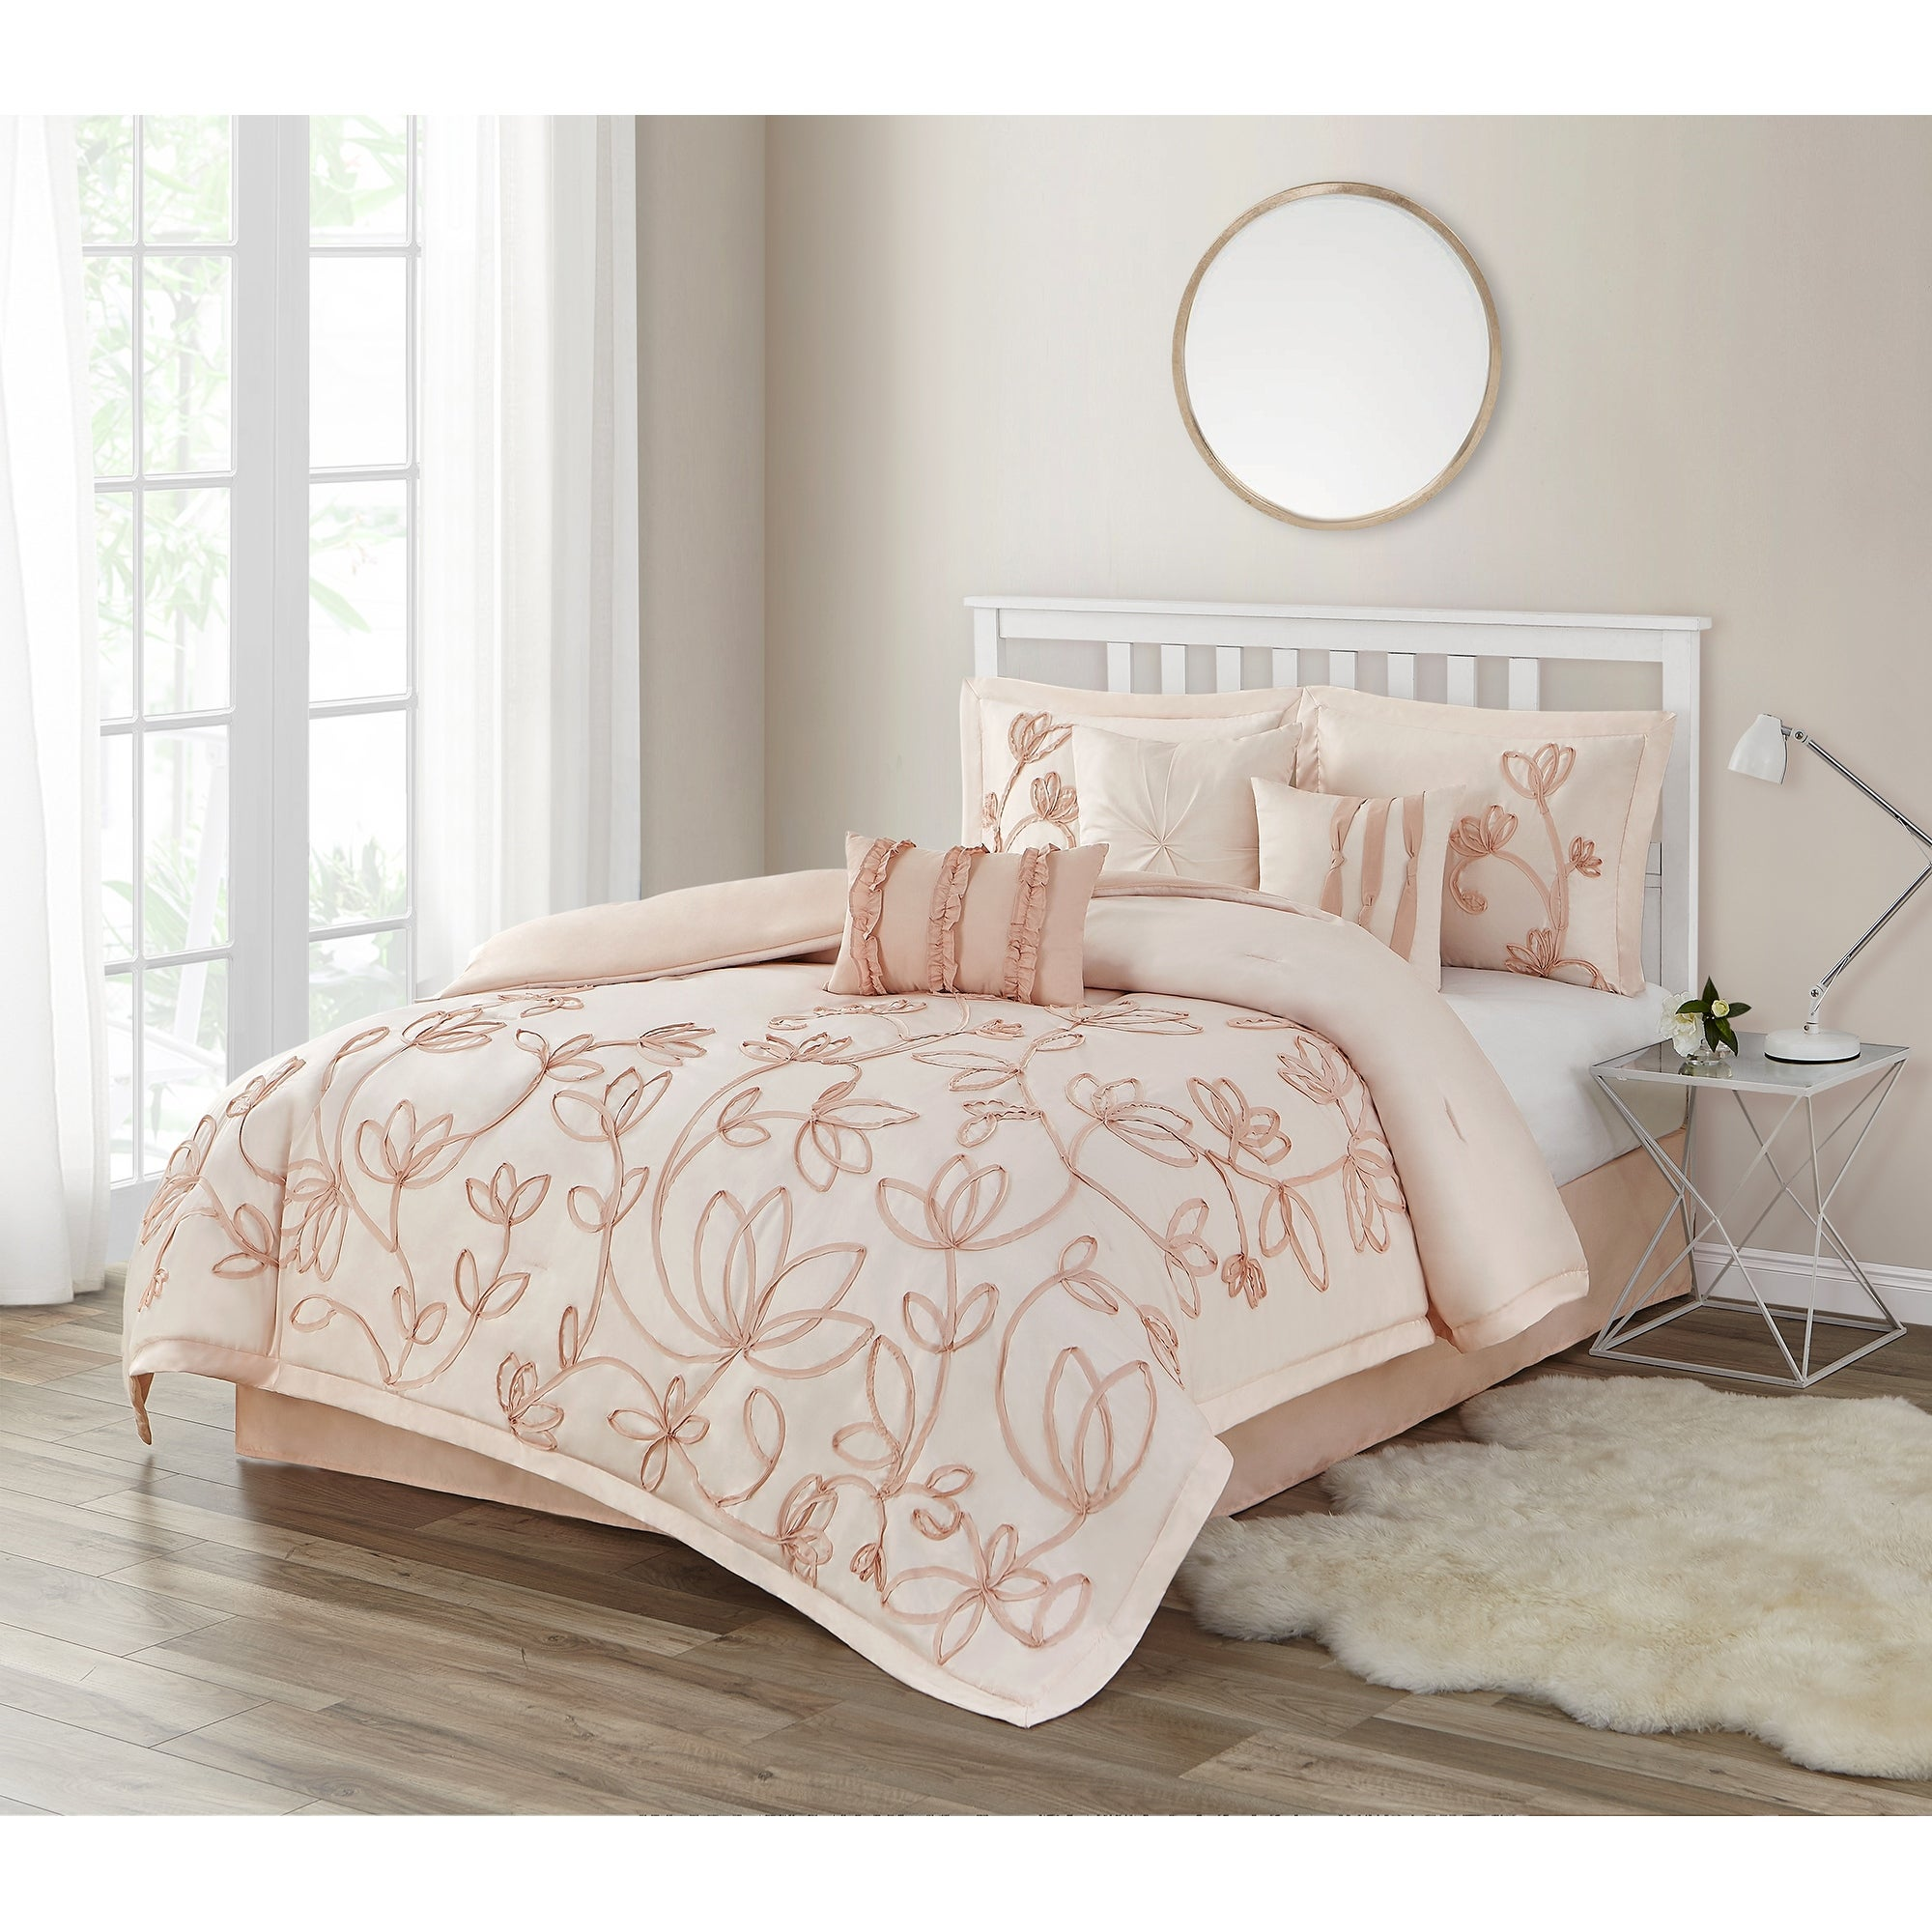 Peach Floral King Comforter Set Overstock 31275784